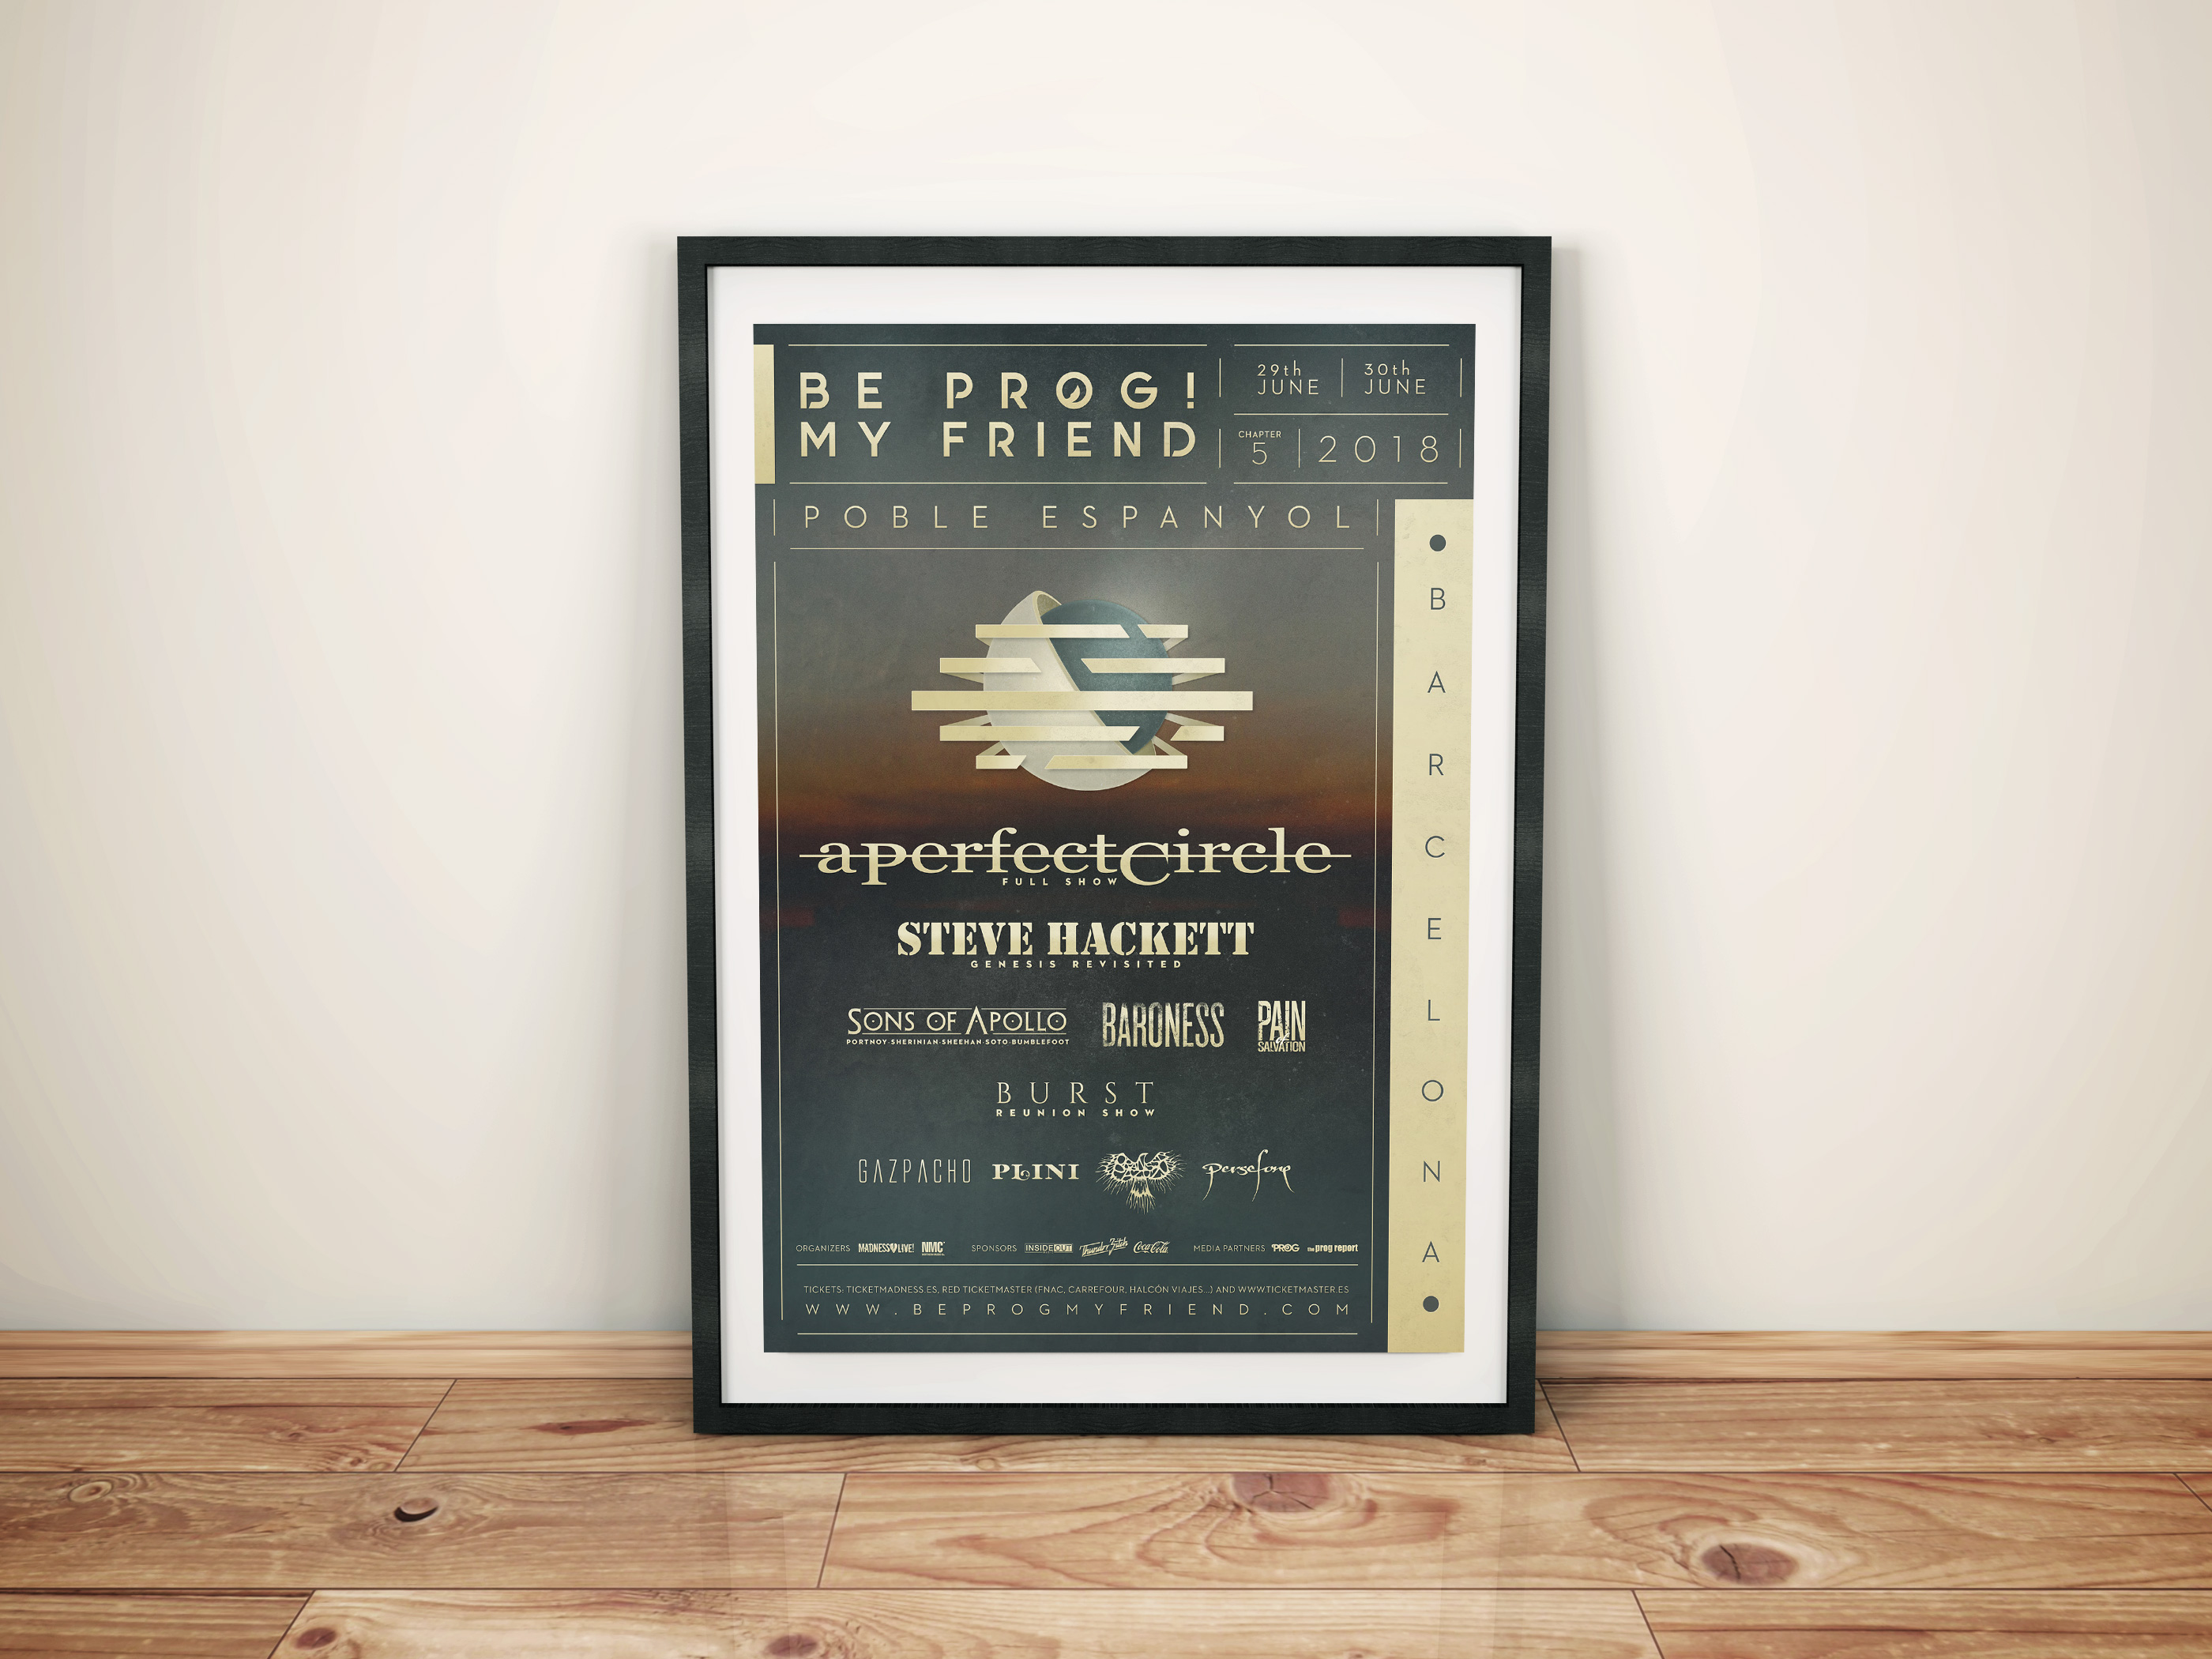 poster-beprog-2018